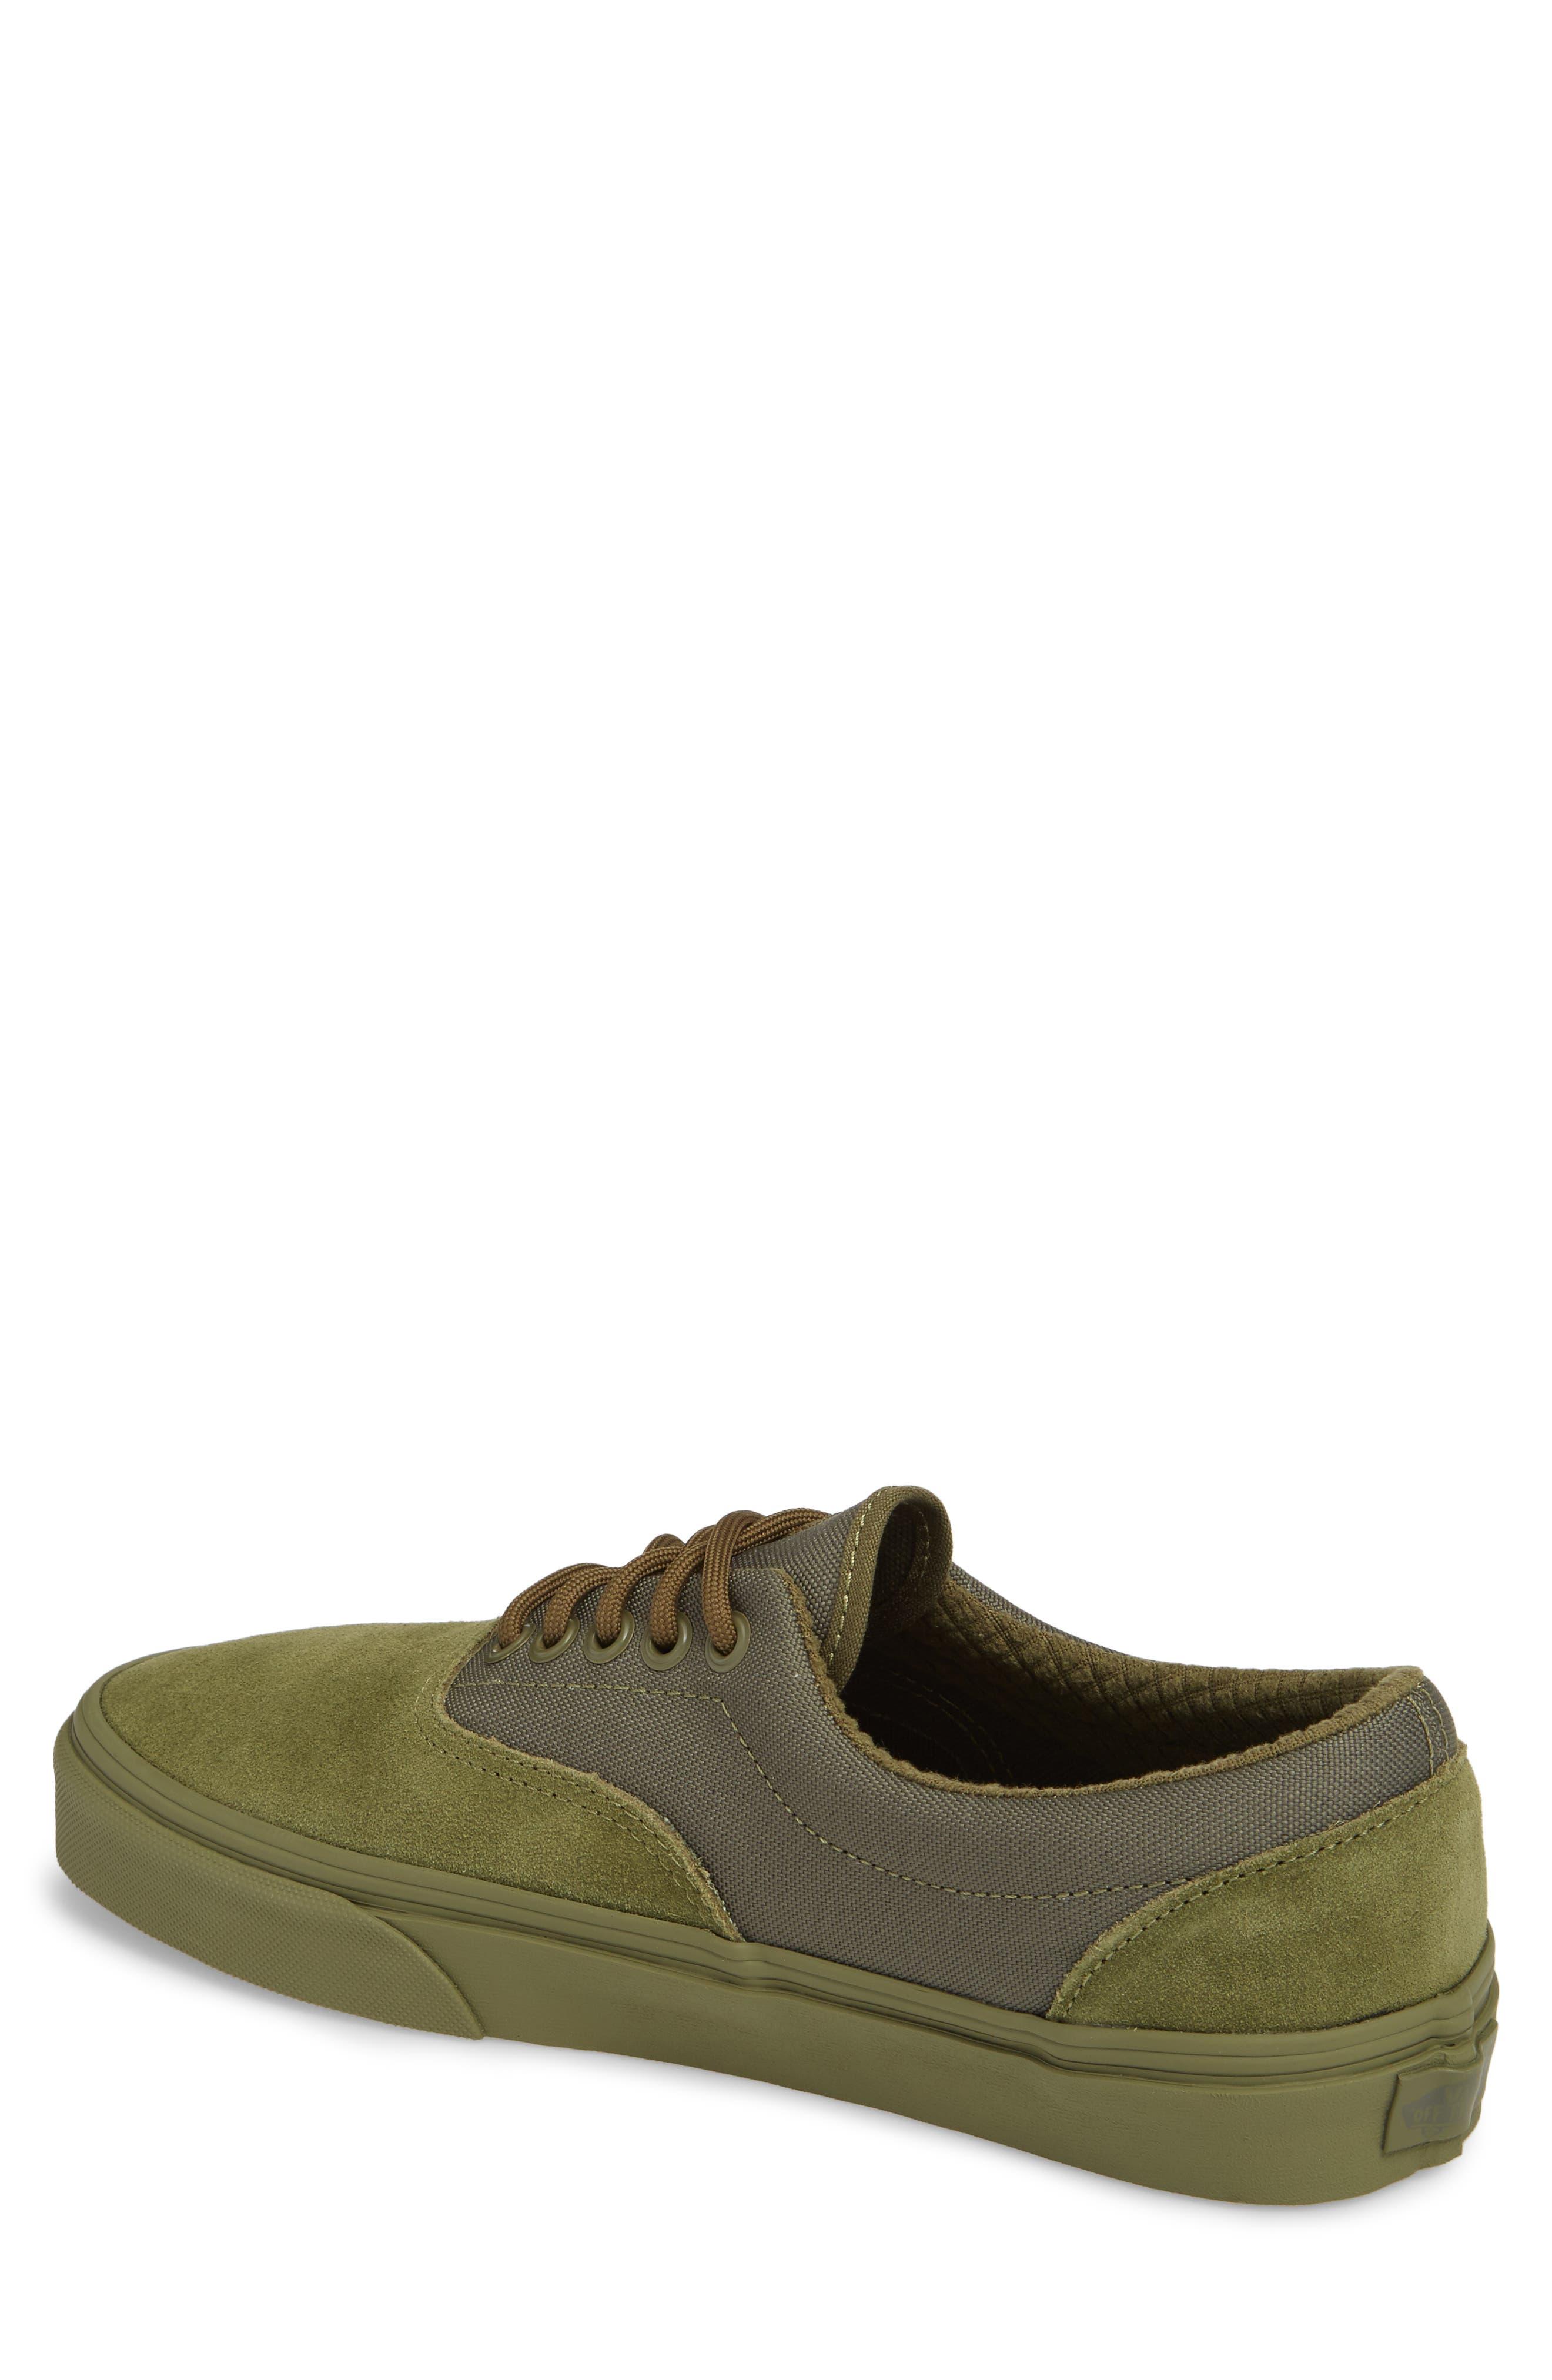 Alternate Image 2  - Vans 'Era' Sneaker (Men)